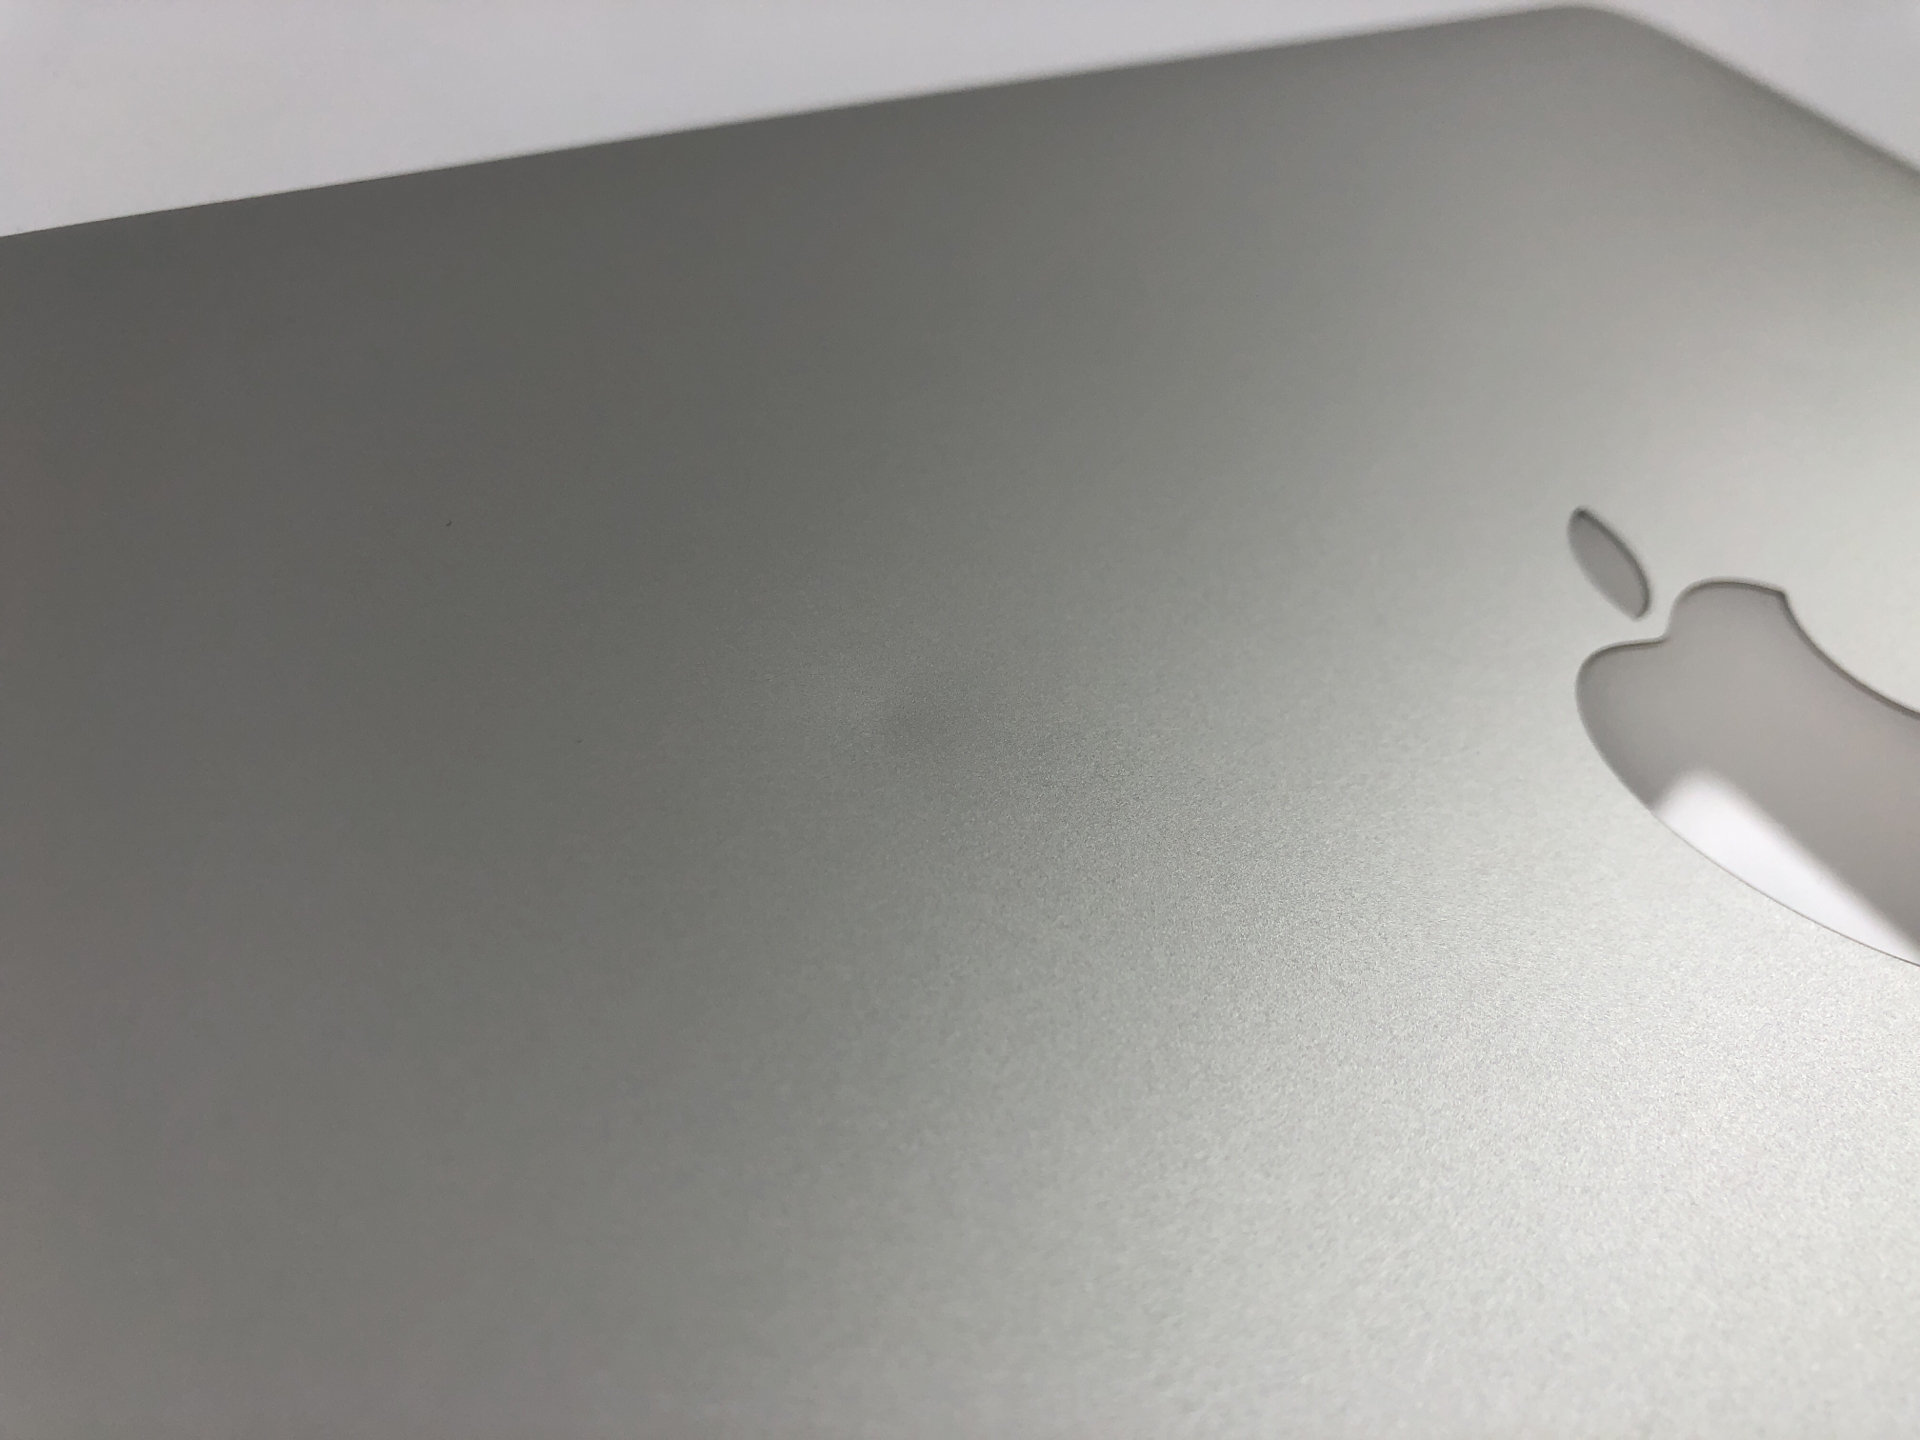 "MacBook Pro Retina 13"" Early 2015 (Intel Core i5 2.9 GHz 16 GB RAM 256 GB SSD), Intel Core i5 2.9 GHz, 16 GB RAM, 256 GB SSD, Bild 4"